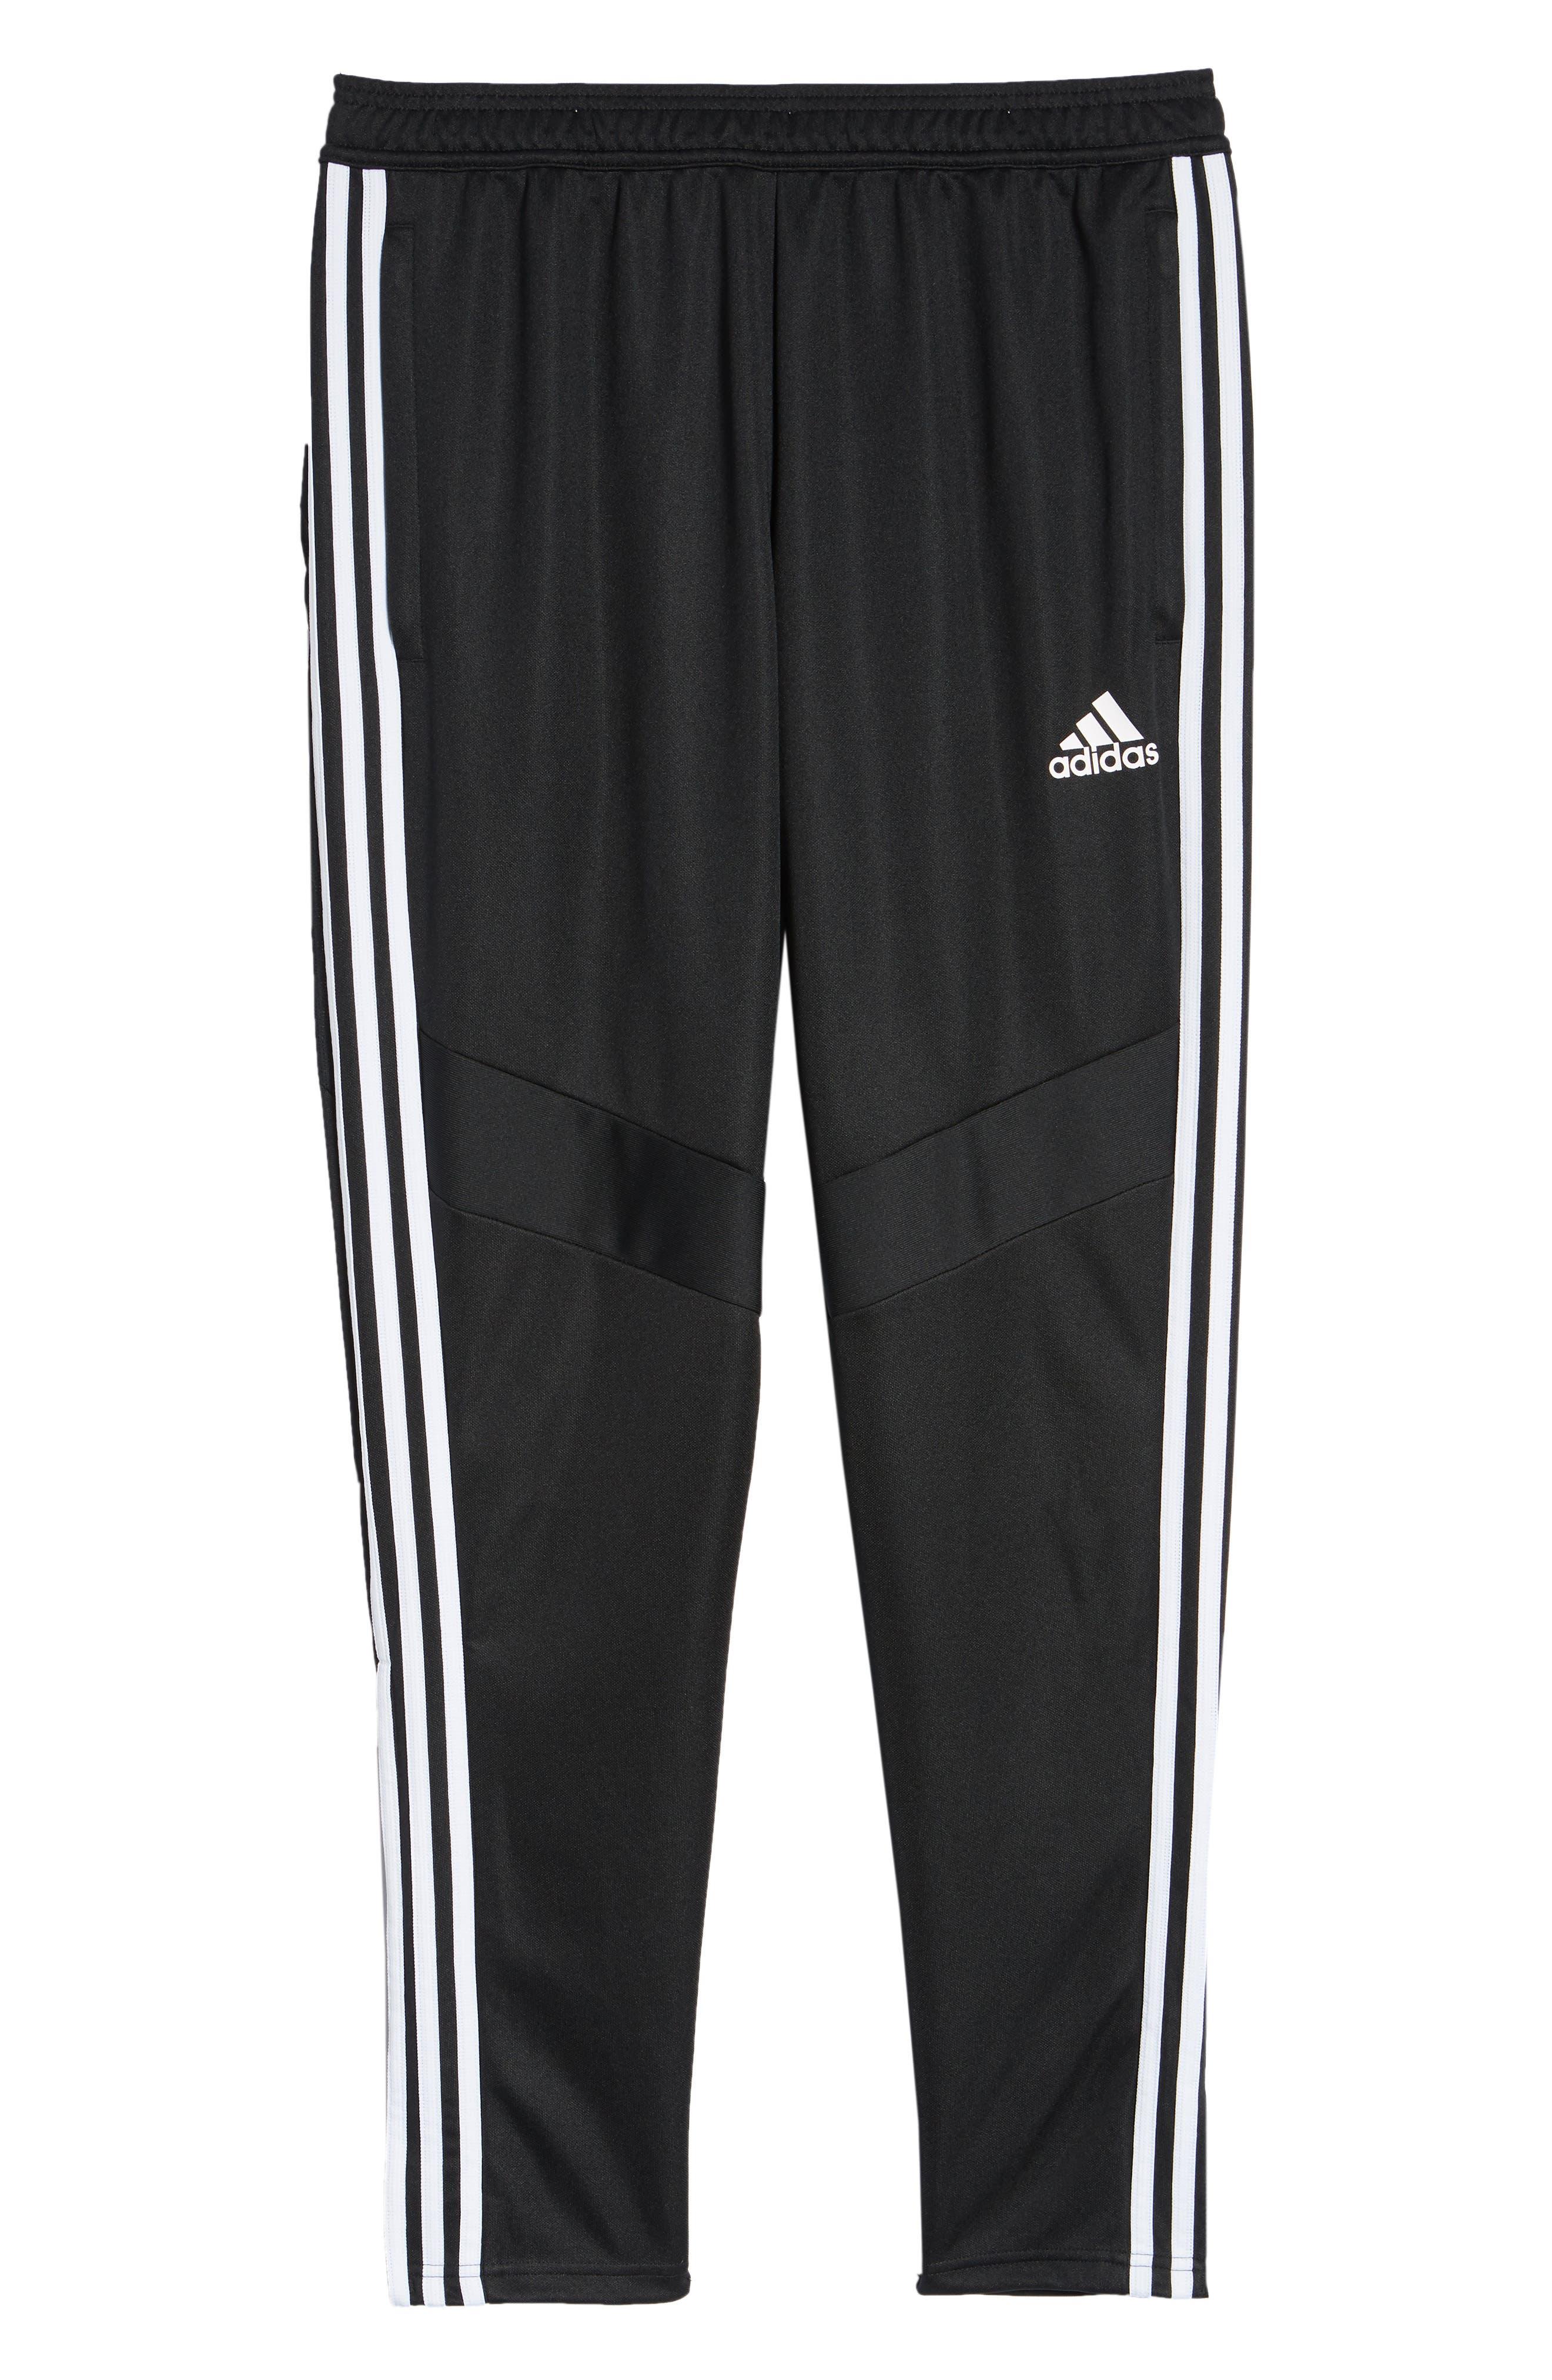 ADIDAS,                             Tiro Soccer Training Pants,                             Alternate thumbnail 7, color,                             BLACK/ WHITE